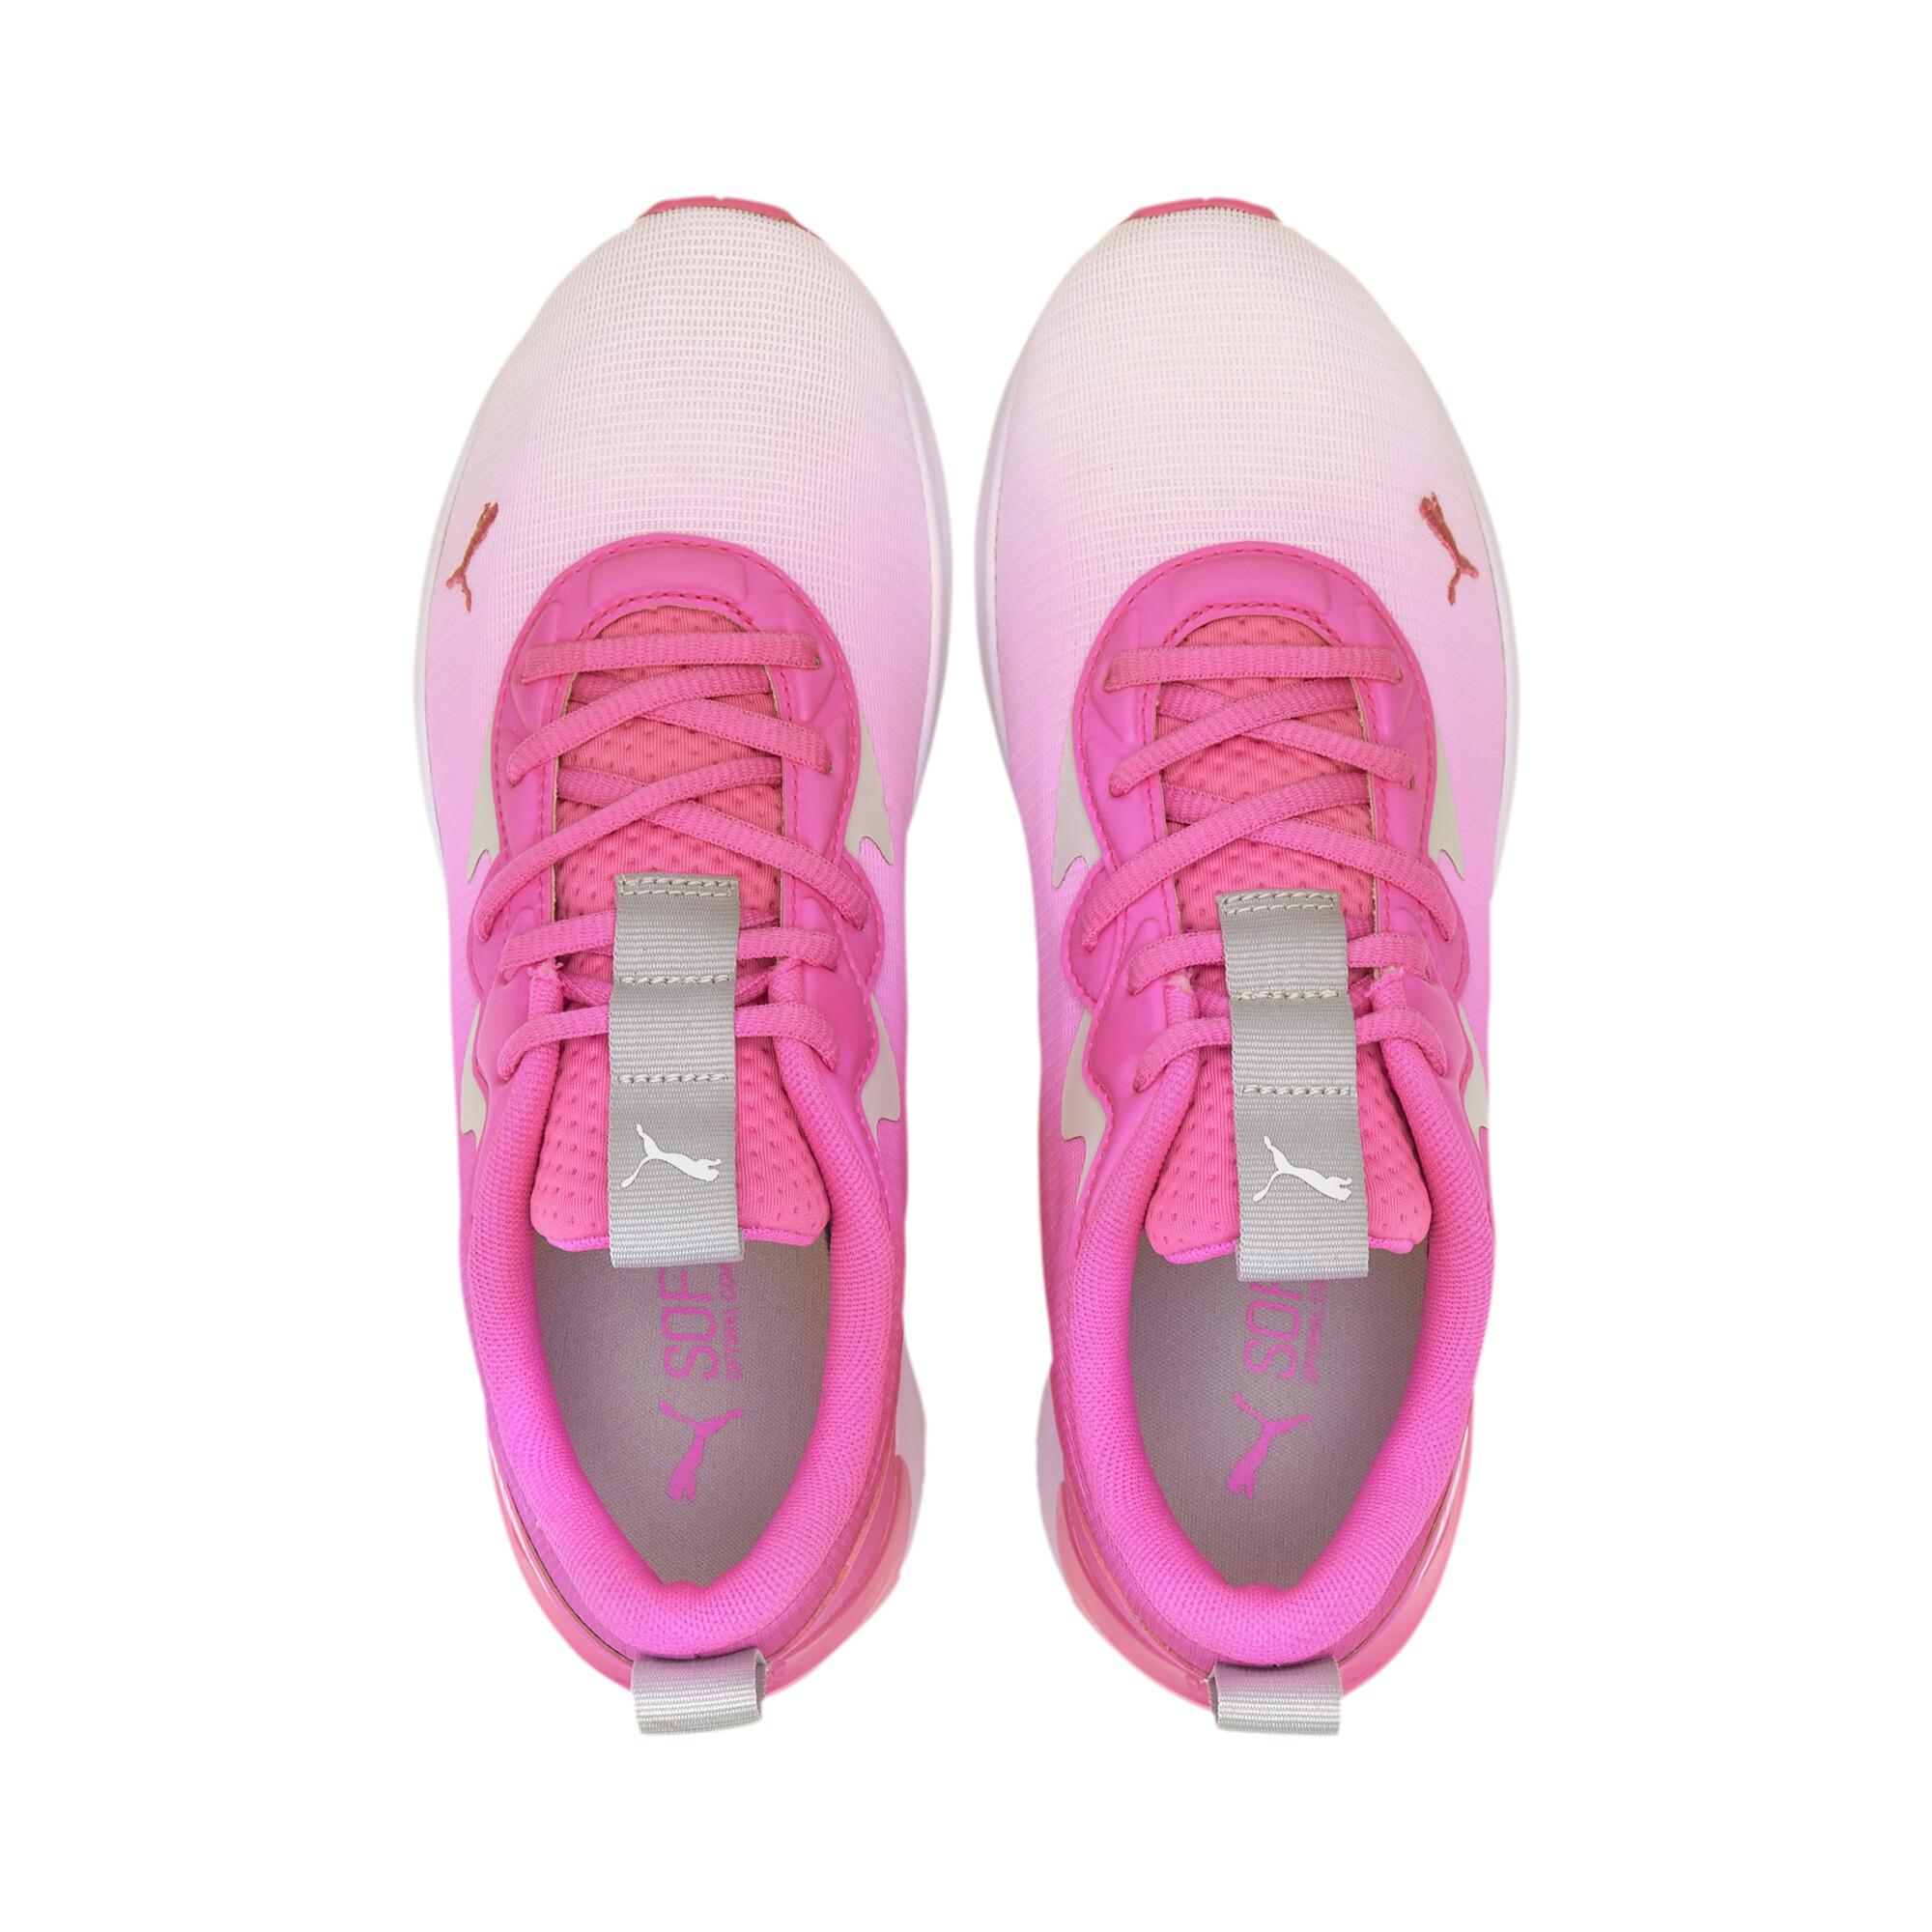 PUMA-Women-039-s-CELL-Initiate-Fade-Training-Shoes thumbnail 8